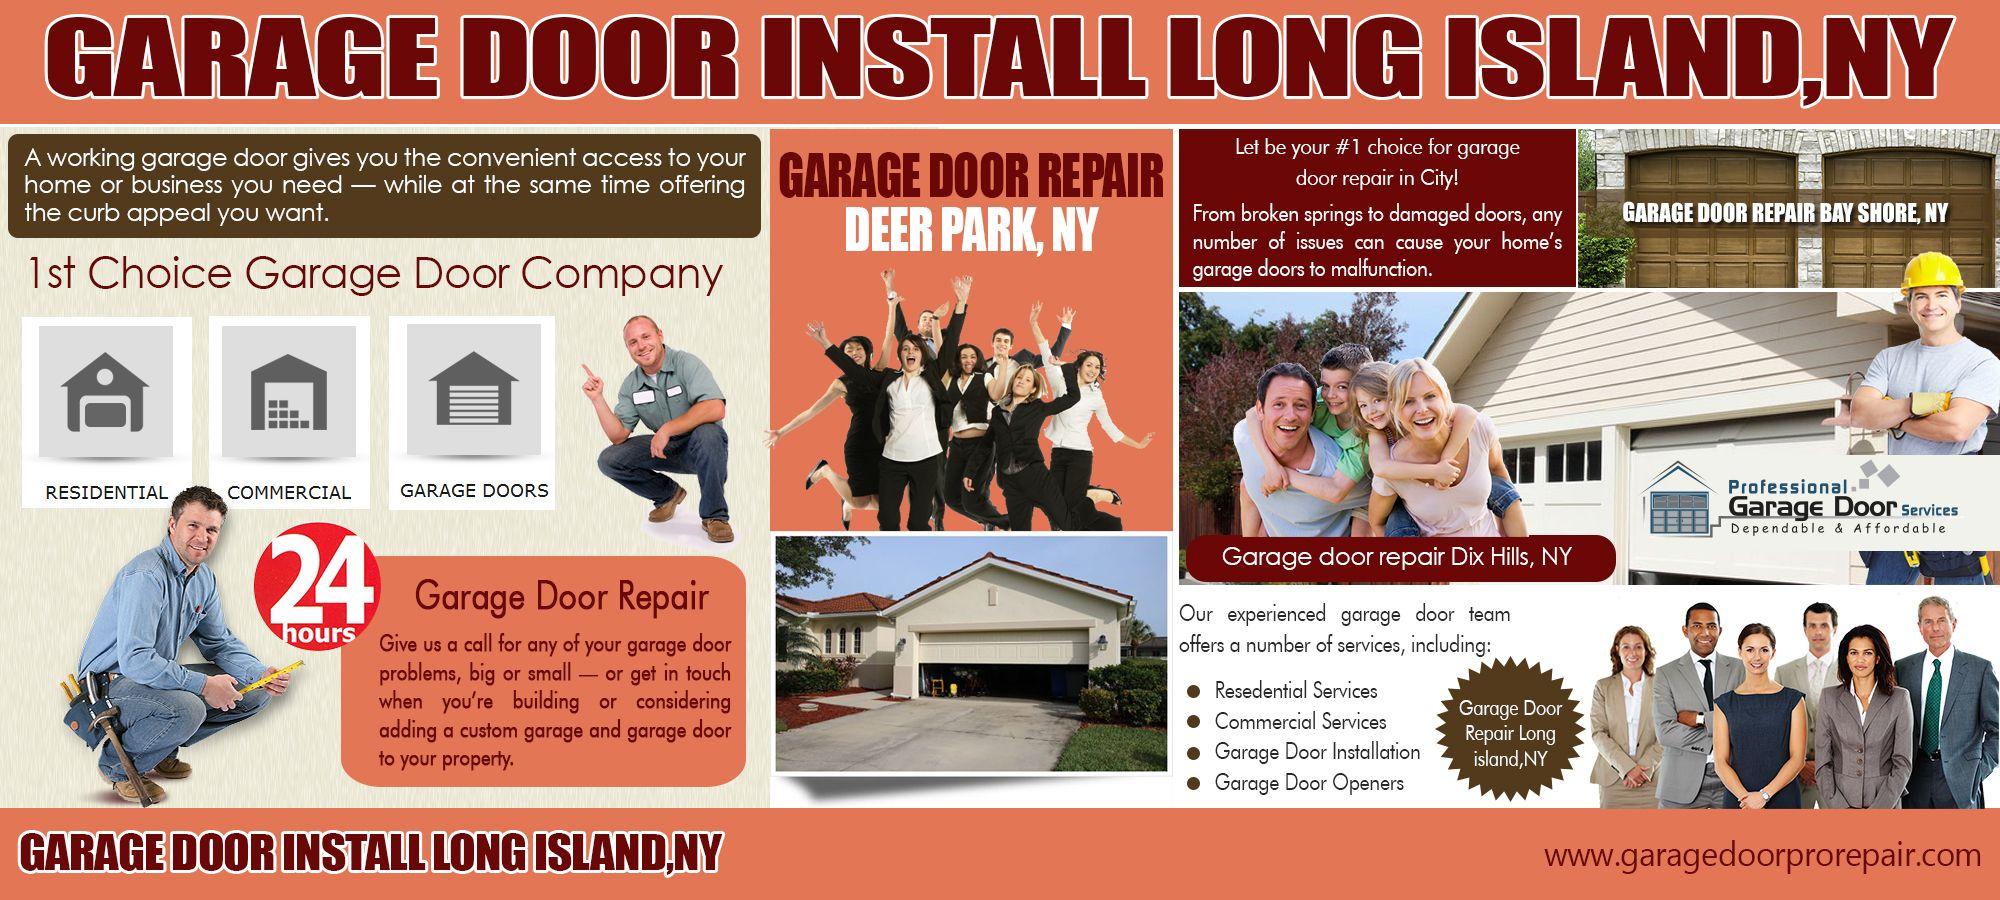 Pin By Garage Door On Garage Door Install Long Island Ny